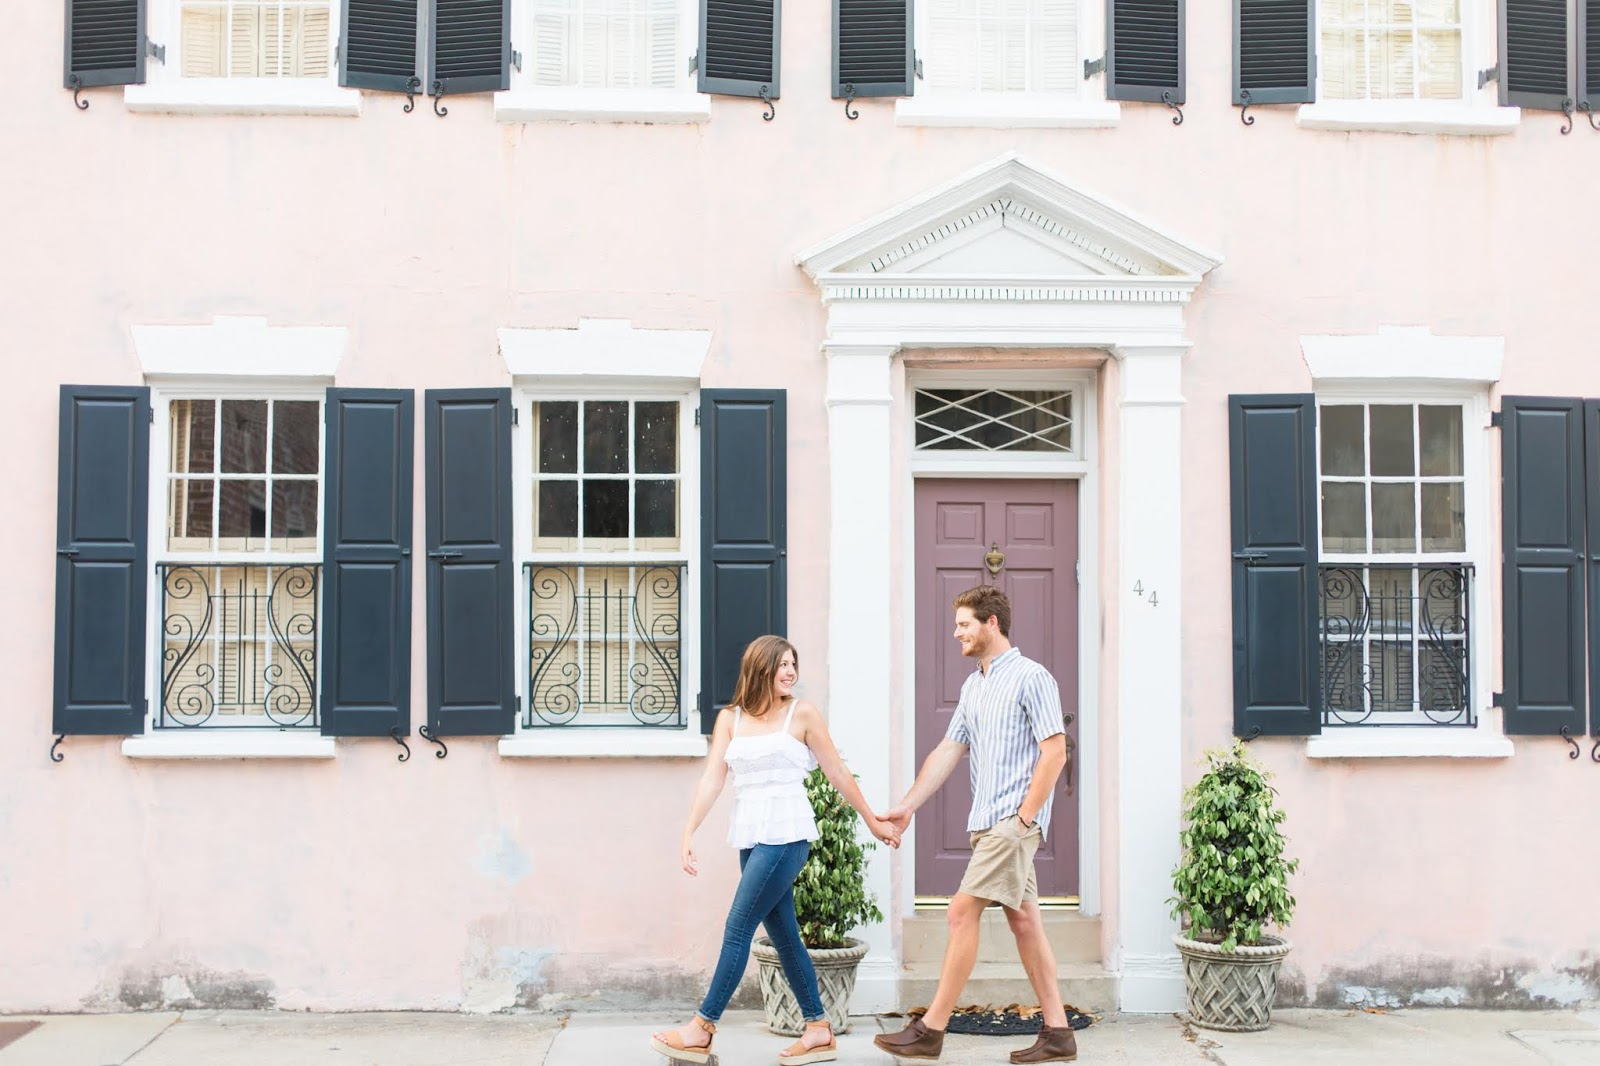 Engagement Photoshoot Tips - Chasing Cinderella